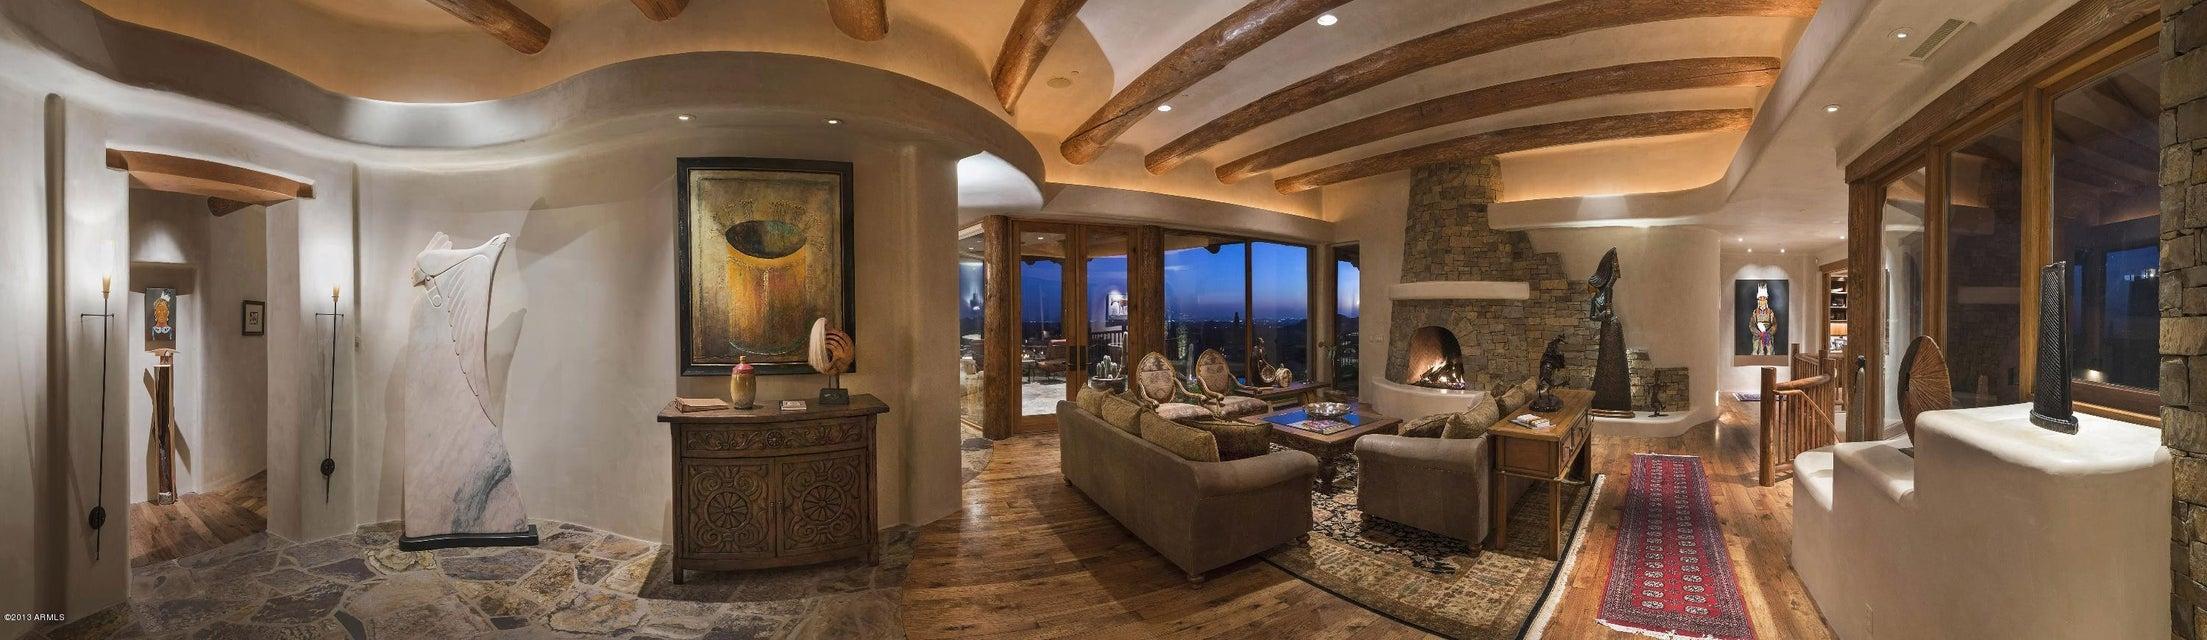 11057 E Distant Hills Drive Scottsdale, AZ 85262 - MLS #: 5009137